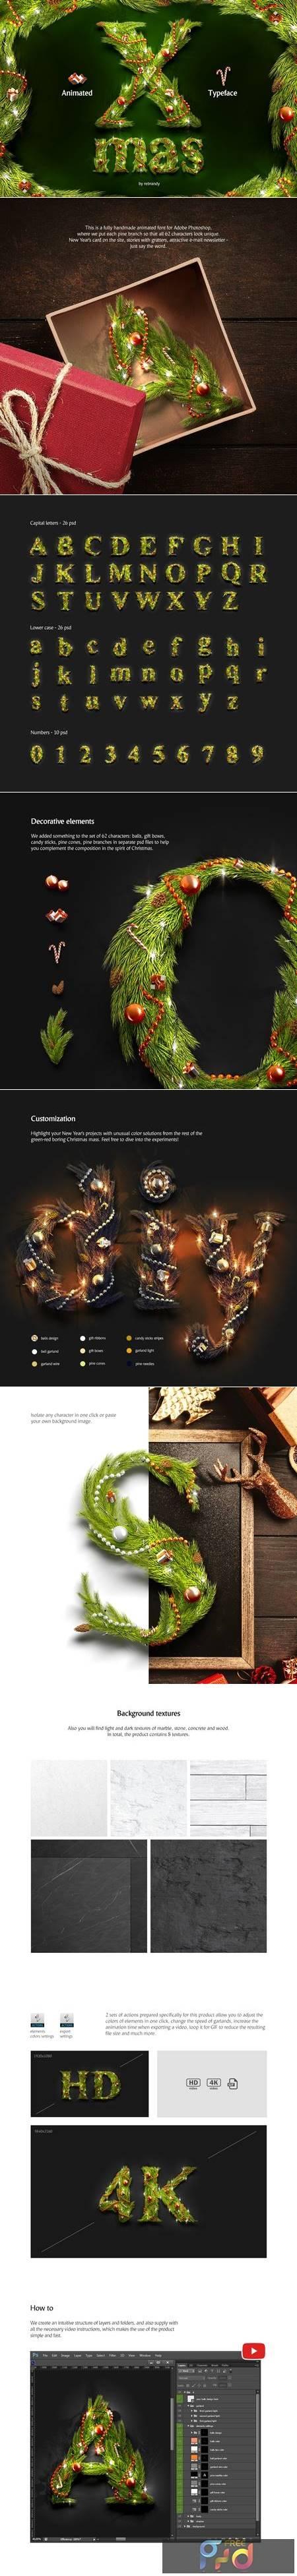 Christmas Animated Typeface 4164004 1